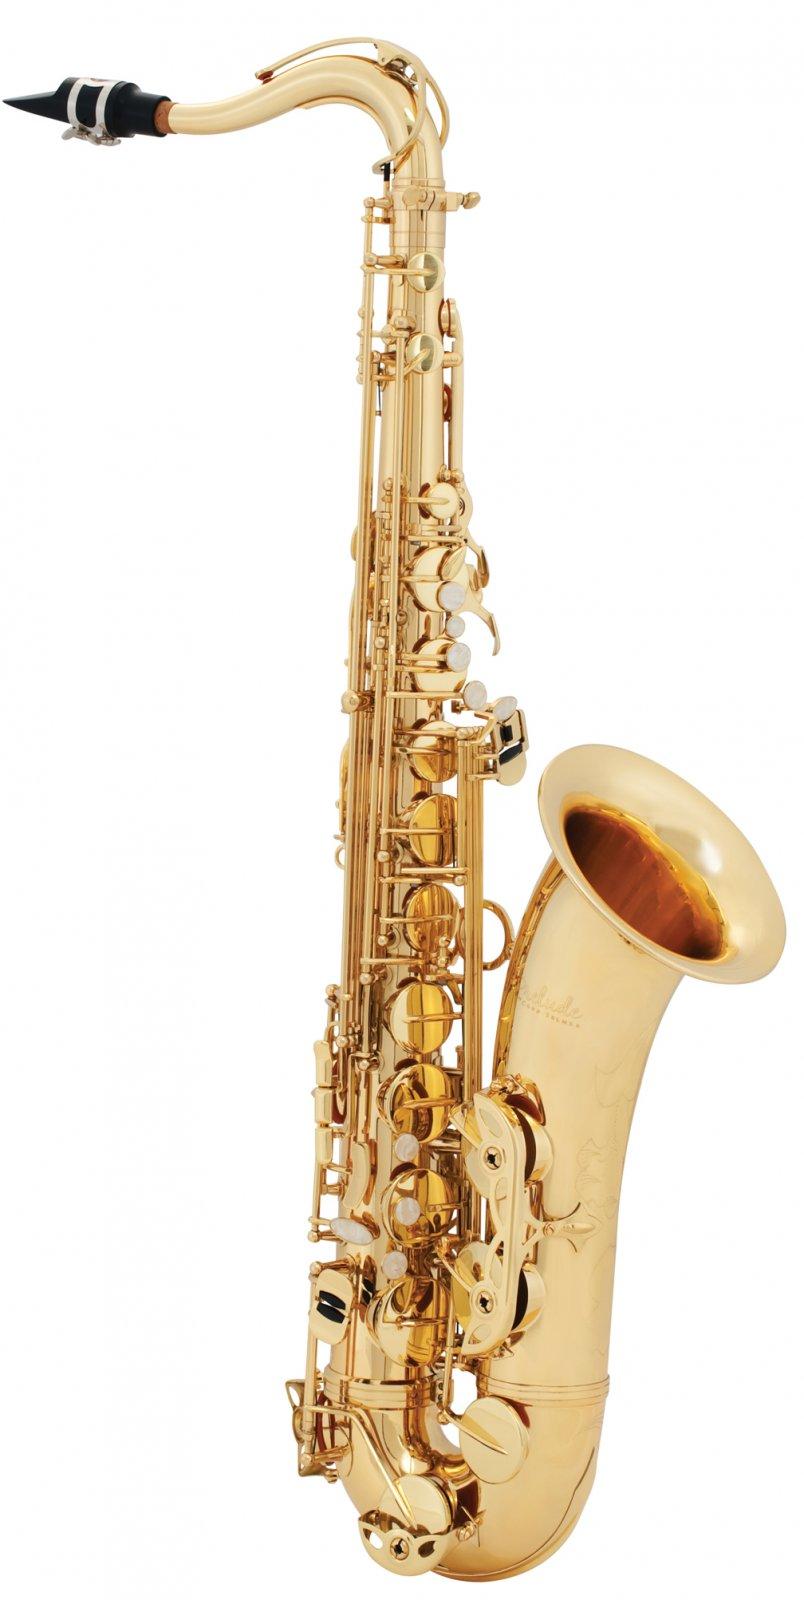 Prelude Student Model TS711 Tenor Saxophone